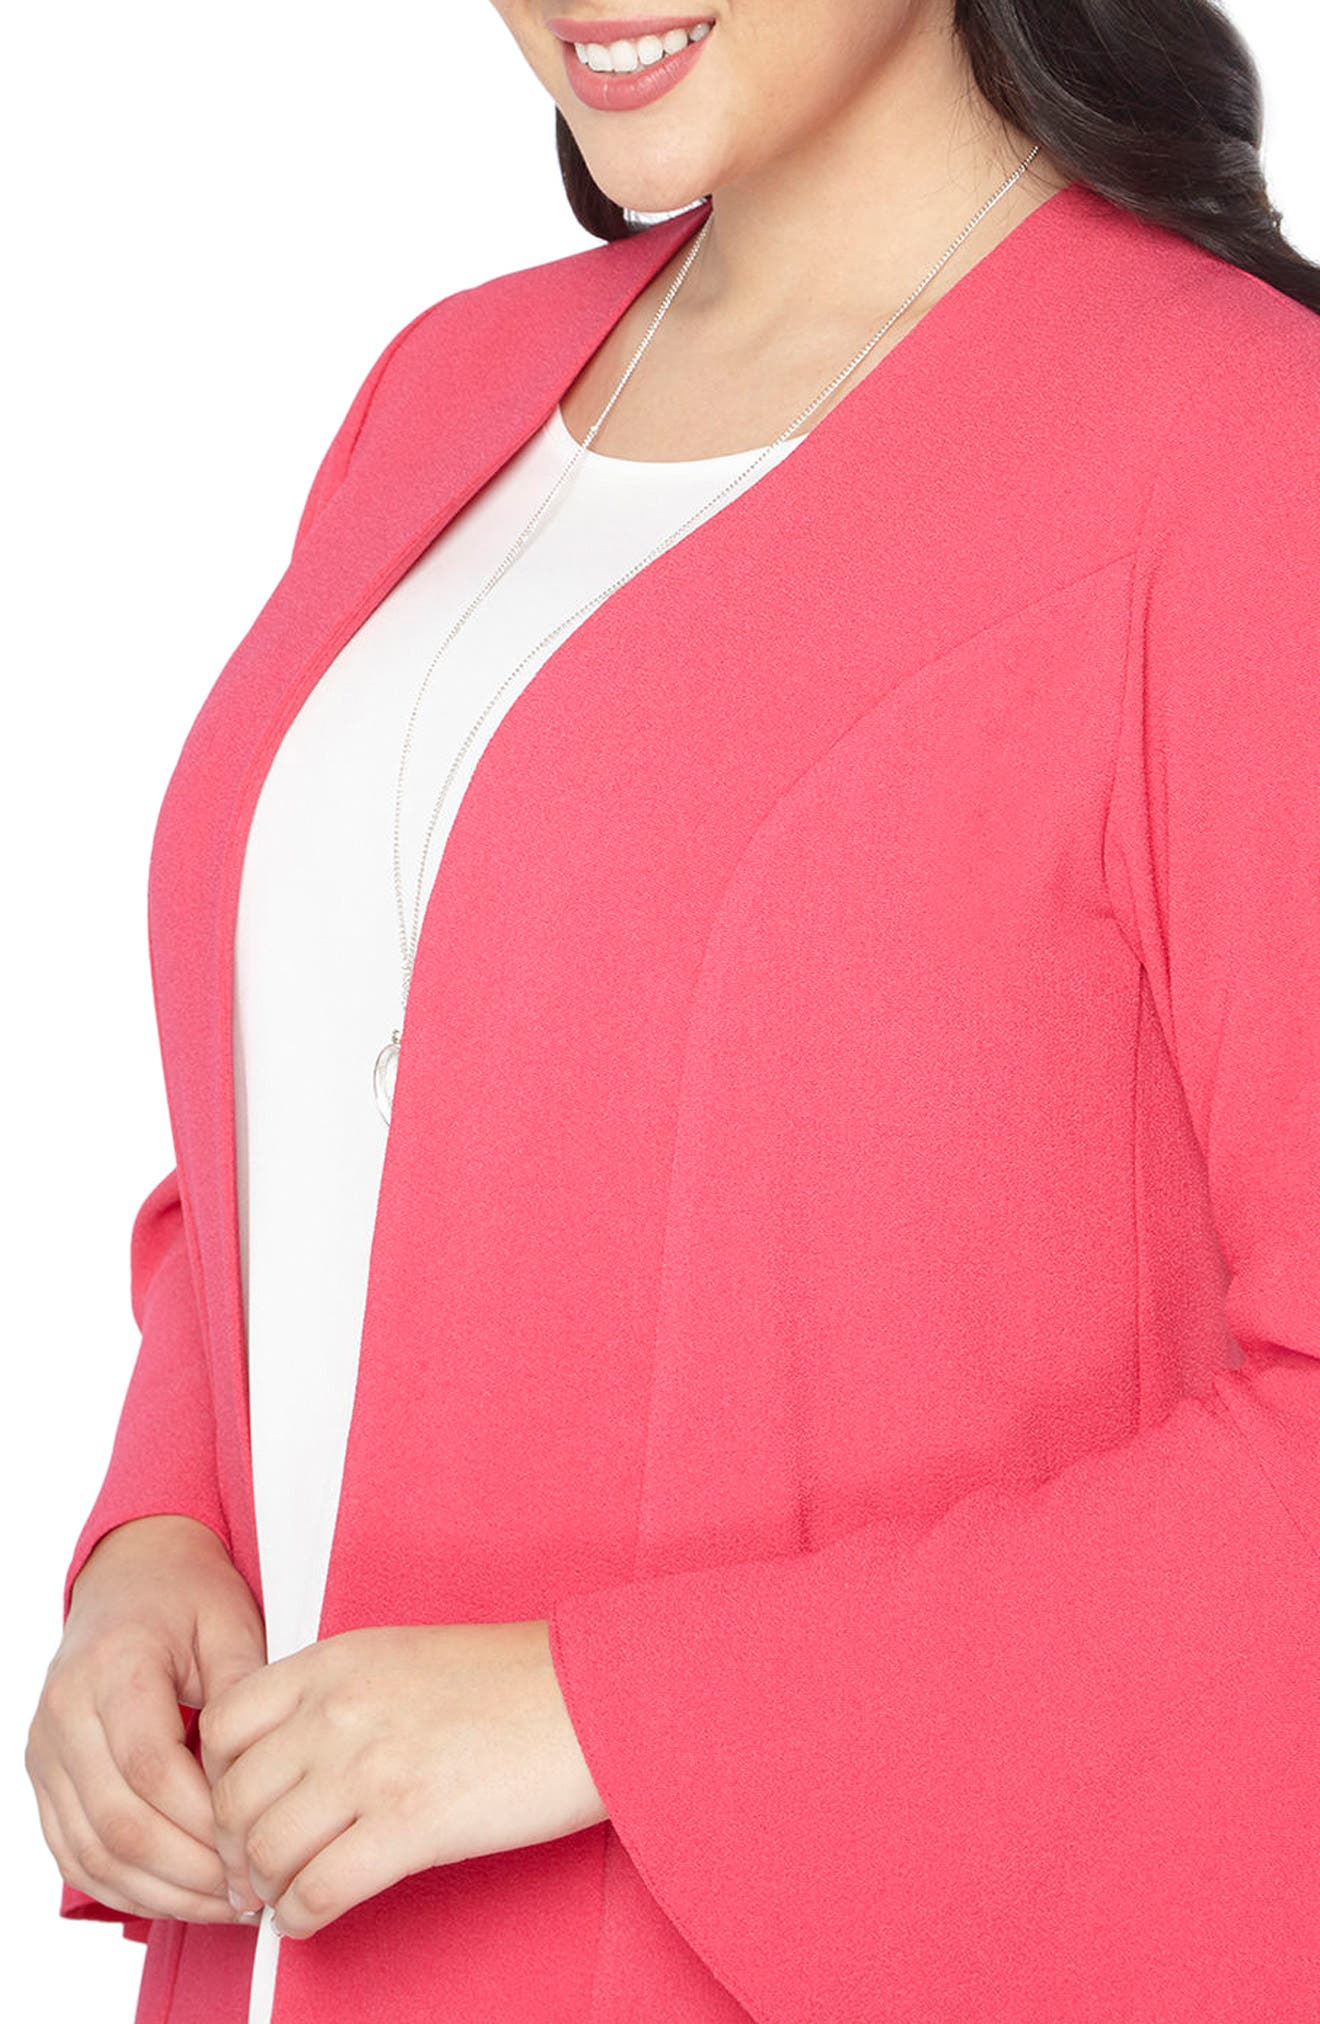 Ruffle Sleeve Jacket,                             Alternate thumbnail 4, color,                             Hot Pink